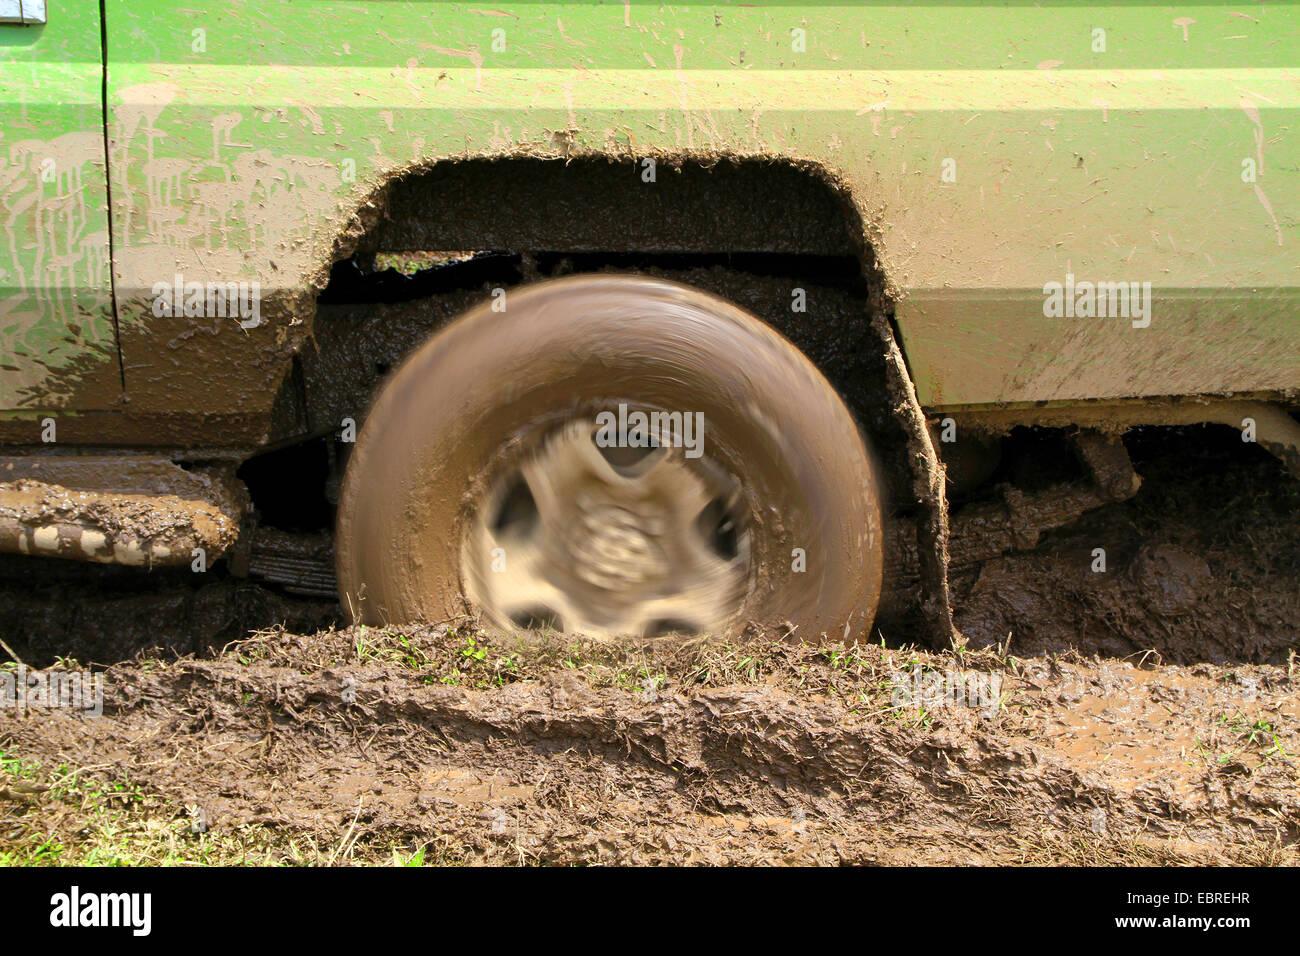 spinning wheel of a safari car sticking in the mud, Tanzania, Serengeti National Park Stock Photo